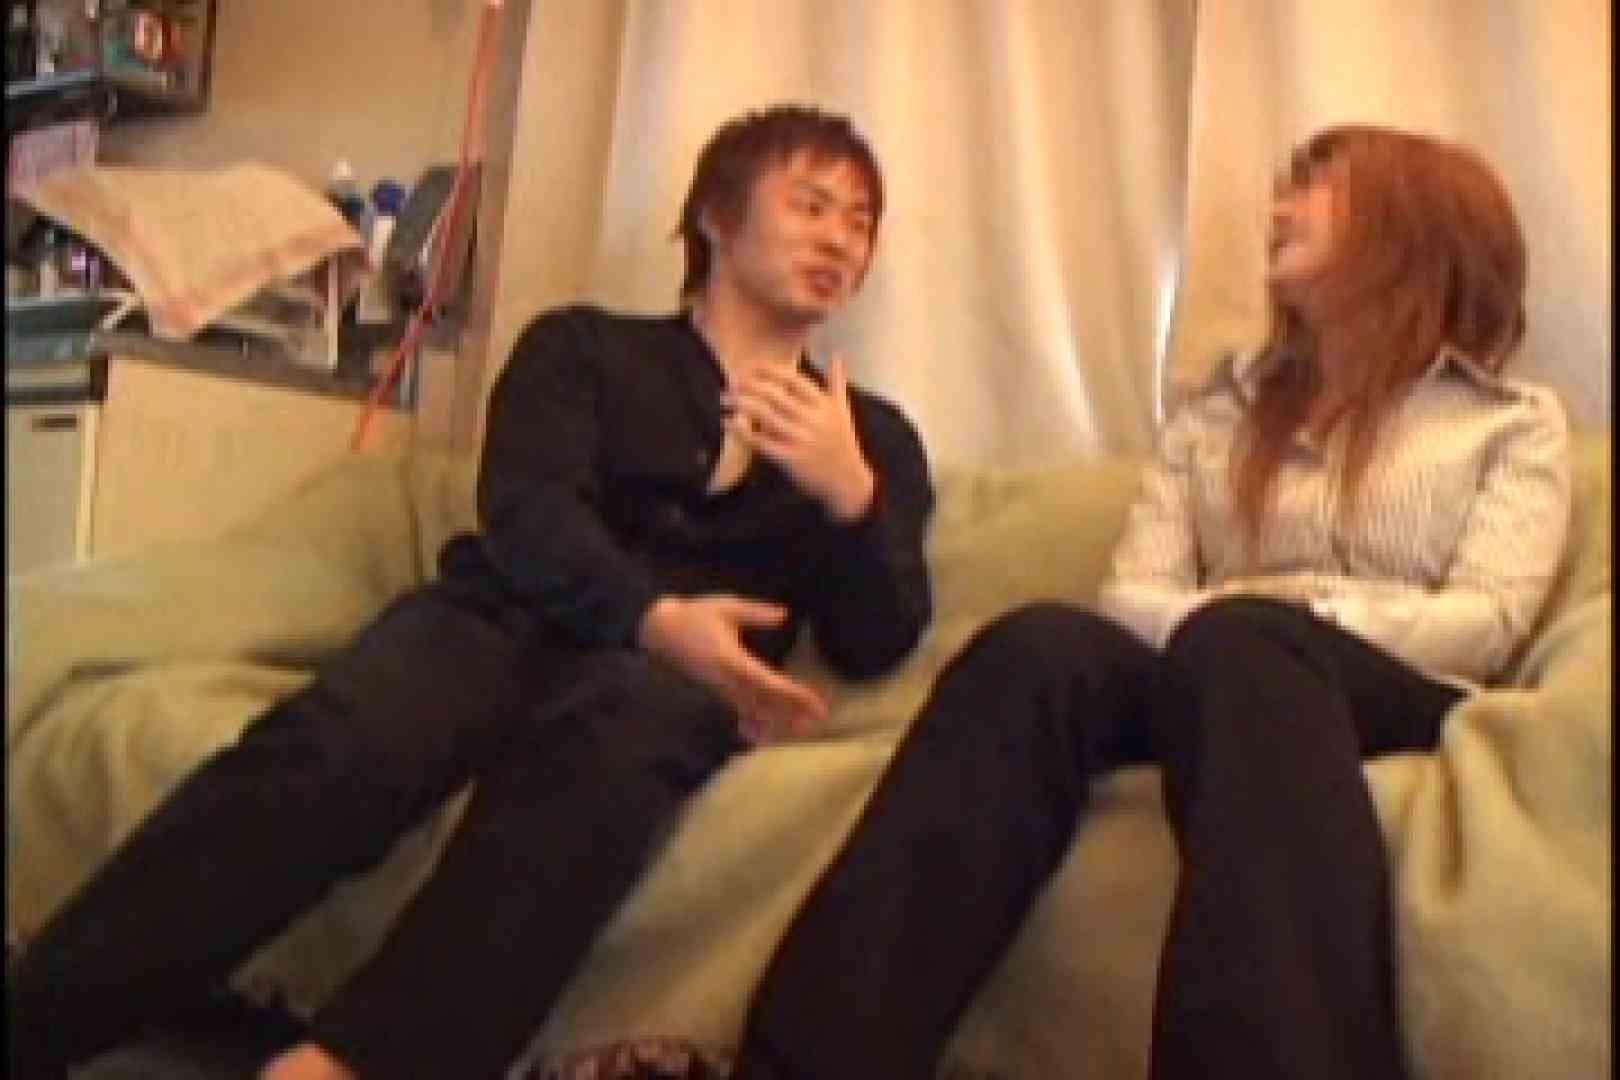 BEST OF イケメン!!男目線のガチSEX vol.03(対女性作品) ゲイのオナニー映像 | イケメンたち  56枚 1